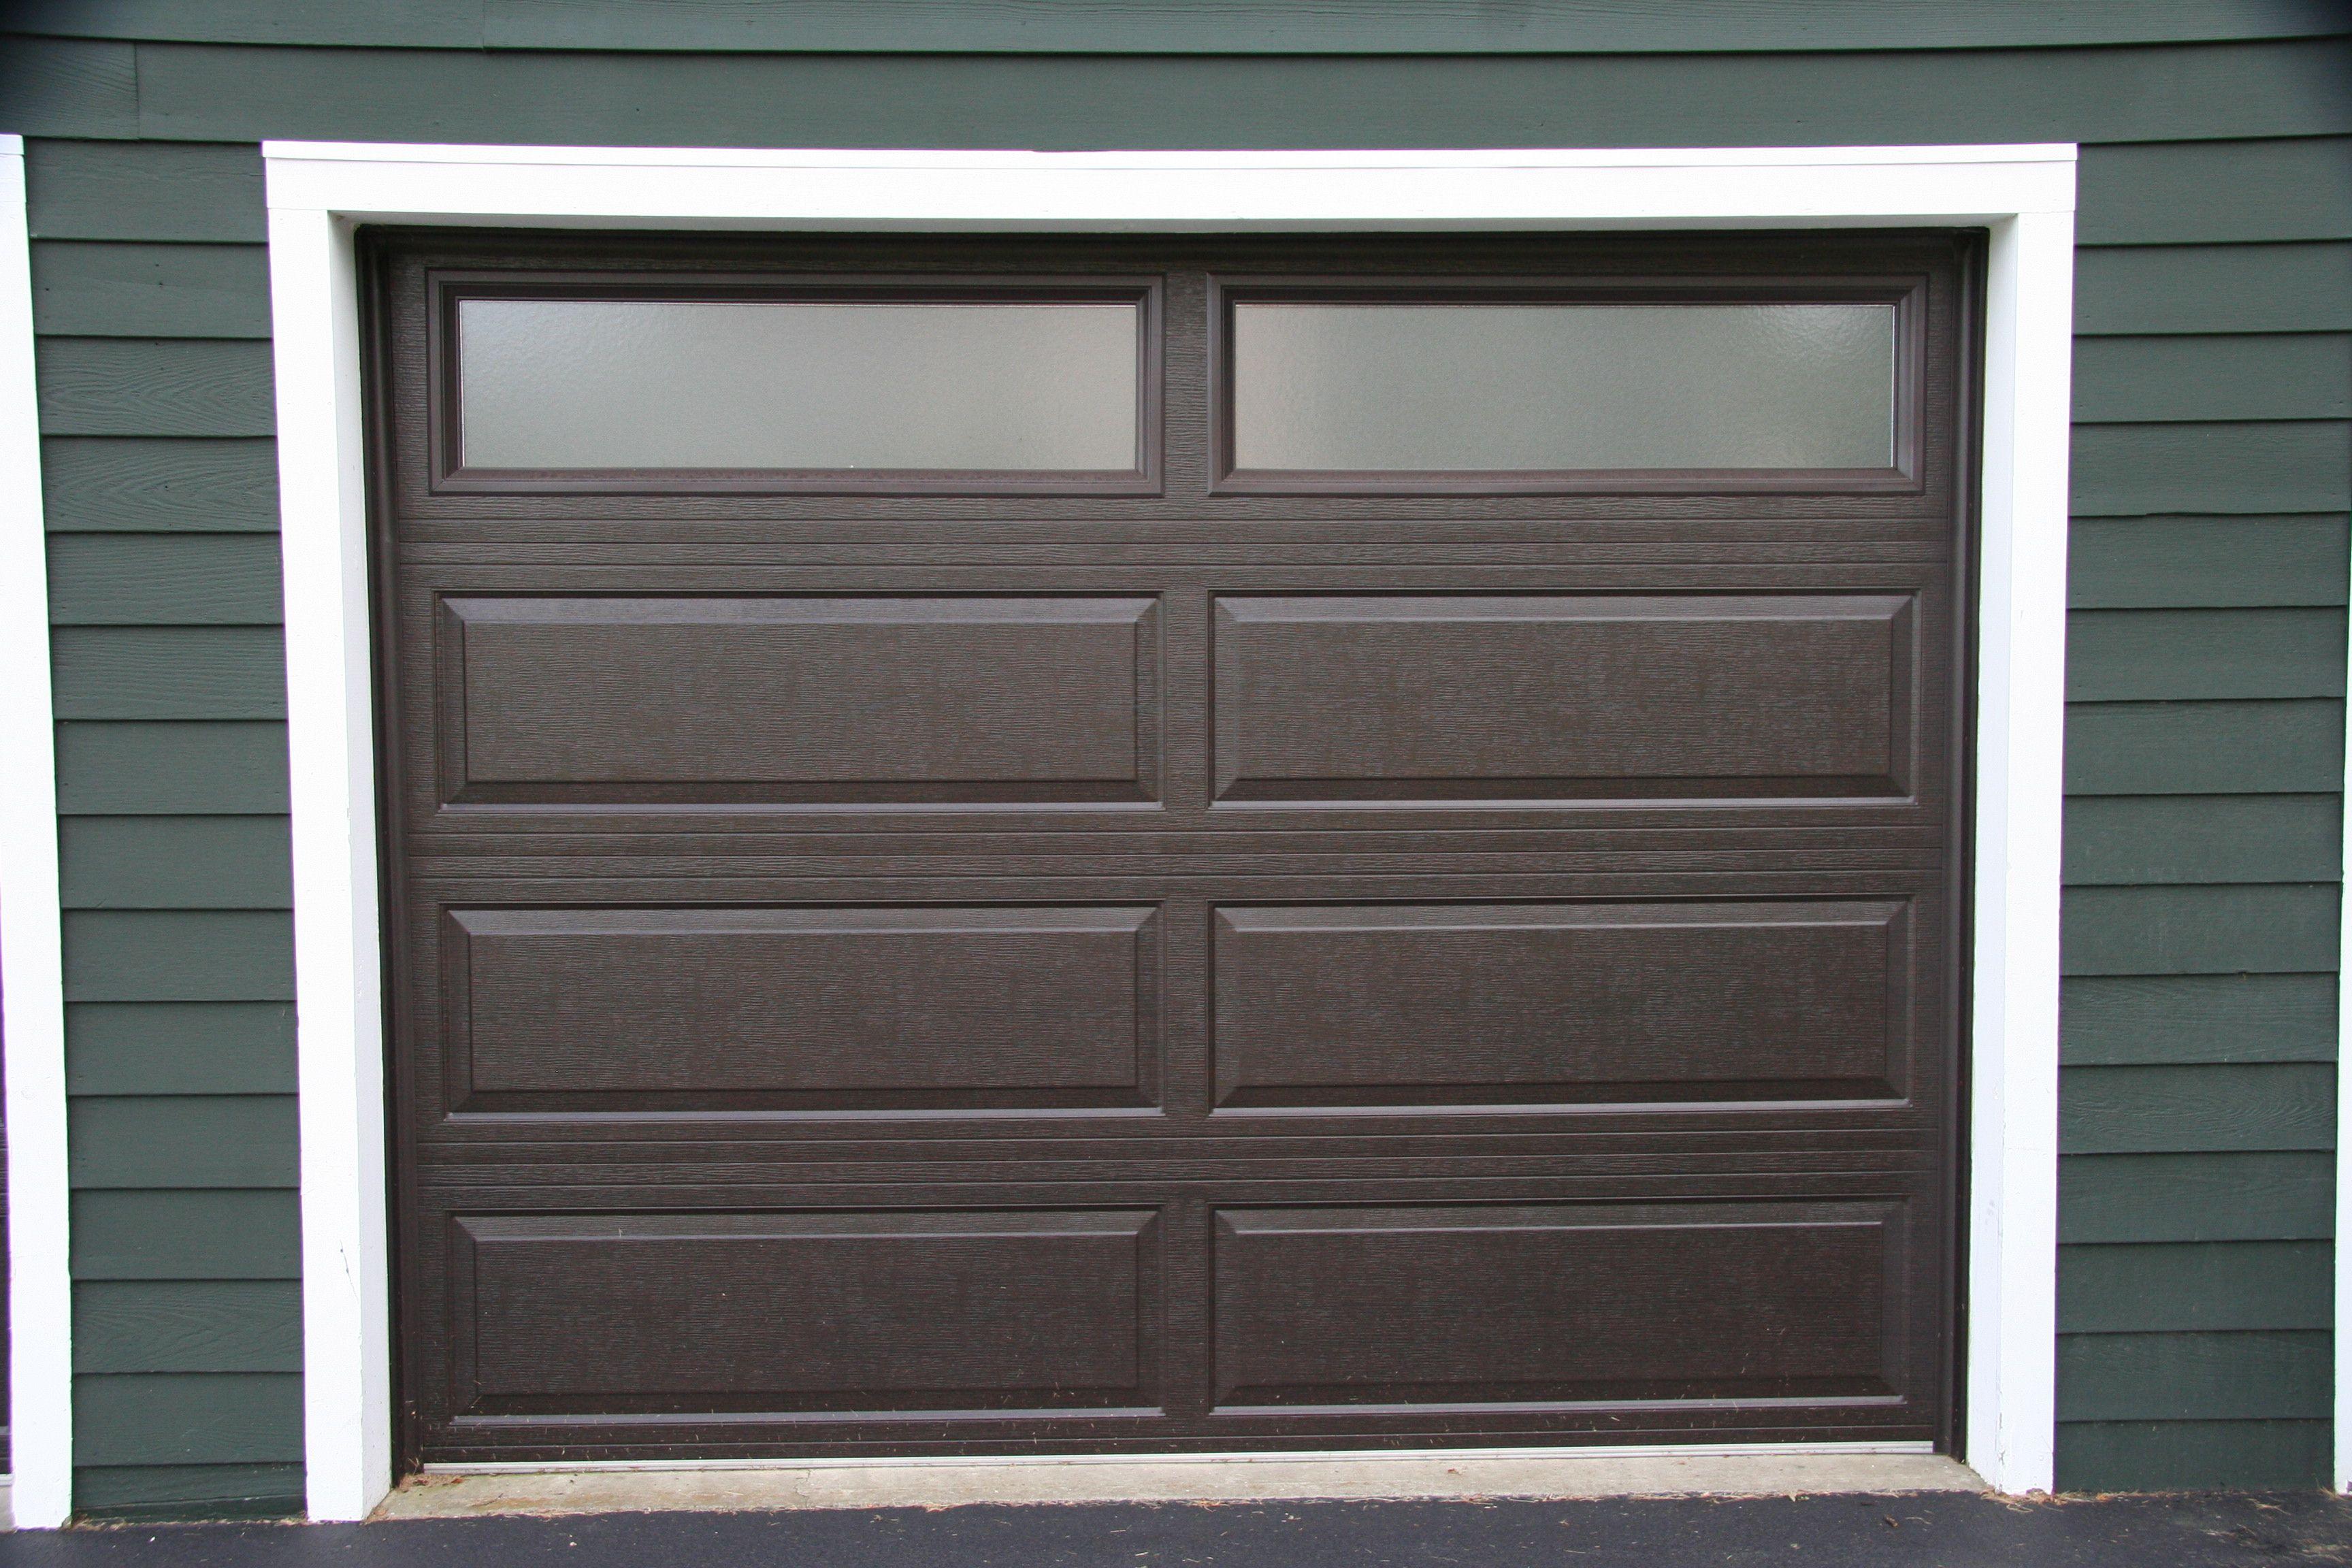 Raynor walnut showcase accufinish raynor garage doors raynor walnut showcase accufinish raynor garage doors rubansaba